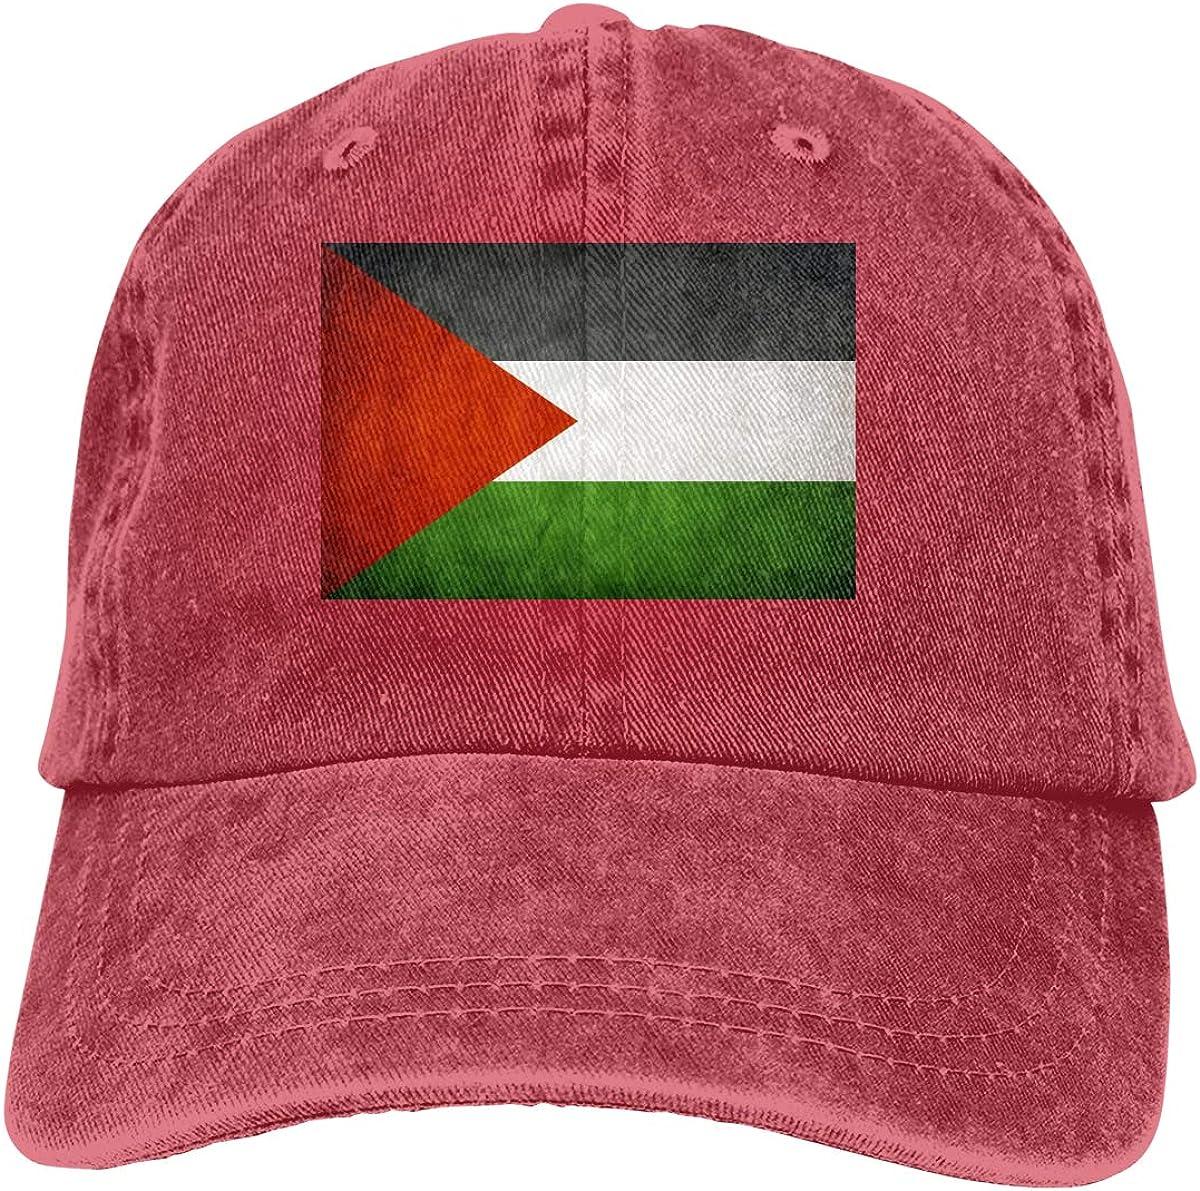 Retro Palestinian Flag Denim Hat Adjustable Plain Cap Baseball Caps